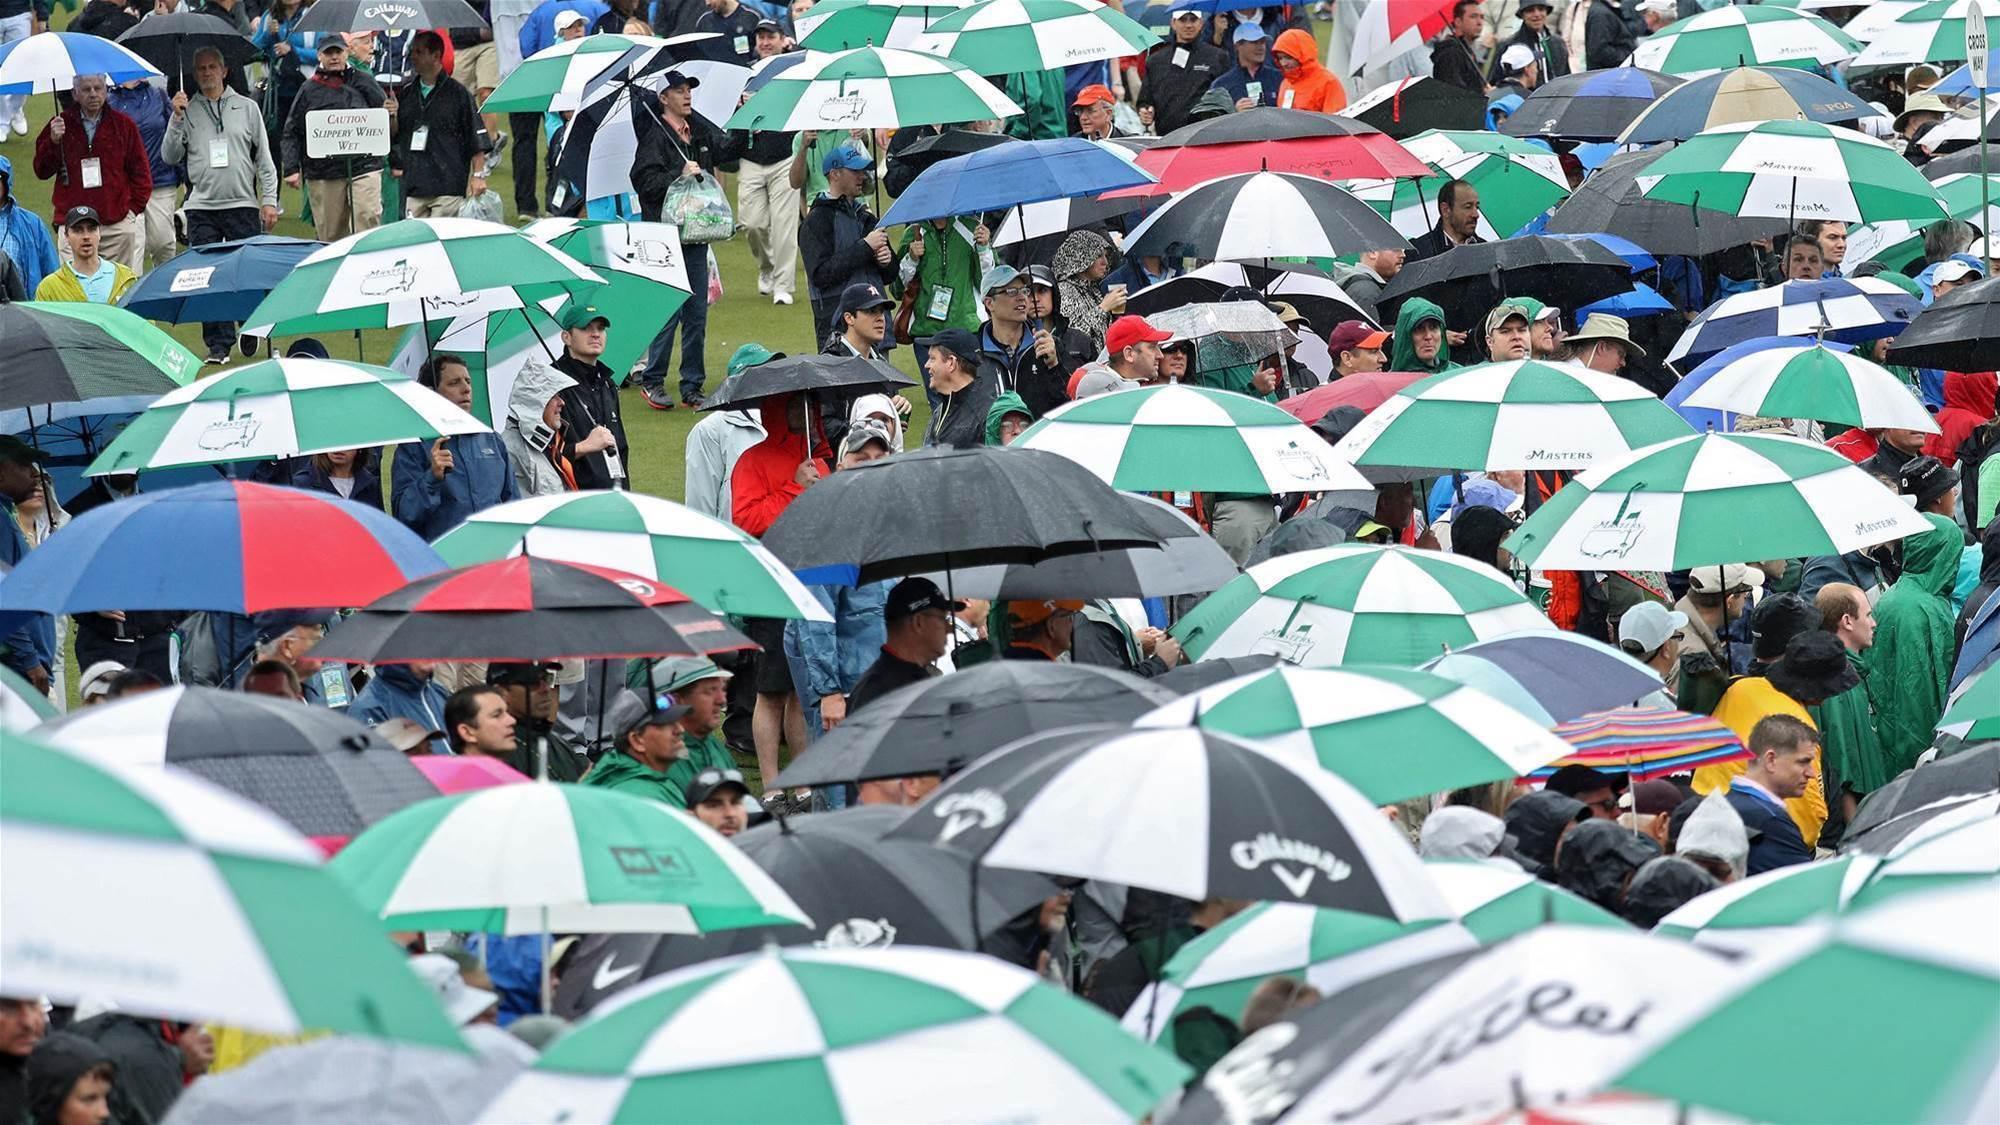 Bad weather threatens Masters practice